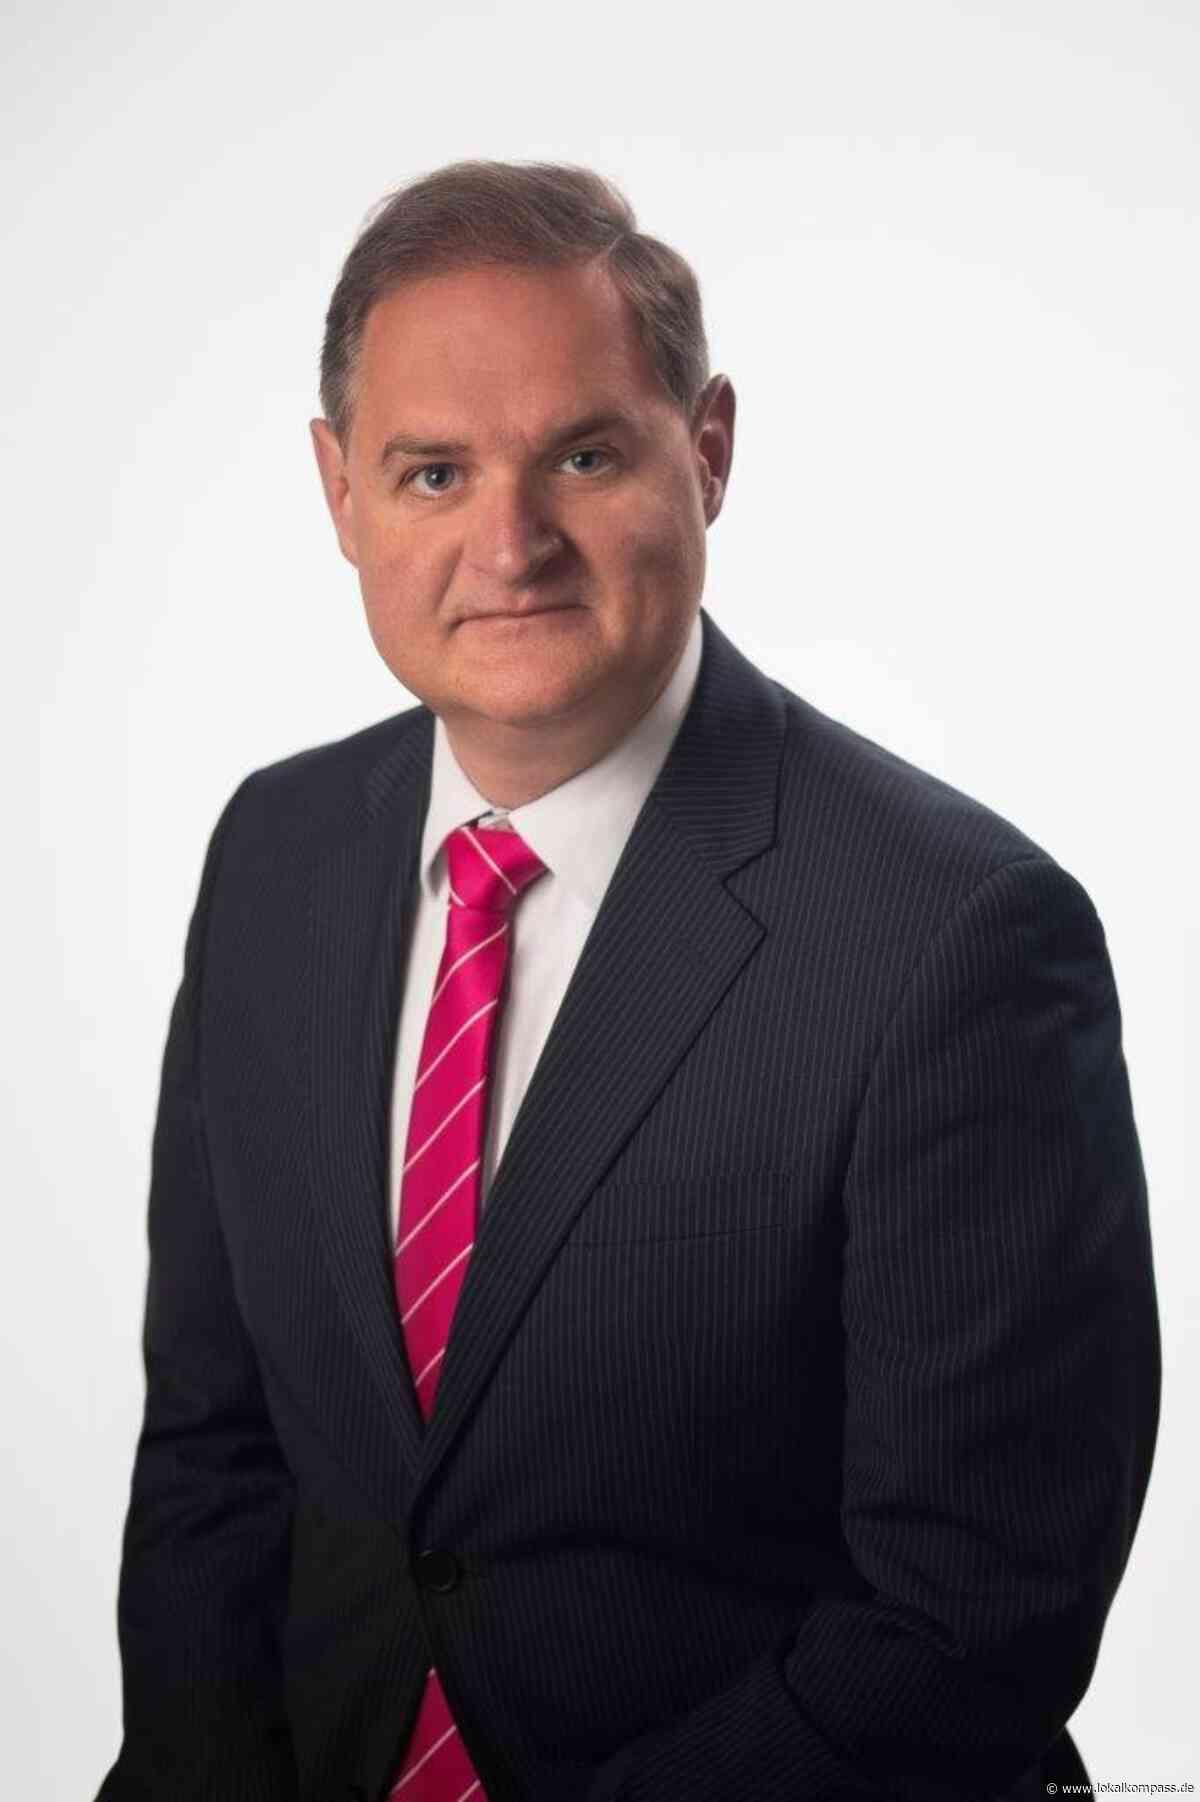 FDP Hemer: Mit Tempo gemeinsam aus der Krise - Hemer - Lokalkompass.de